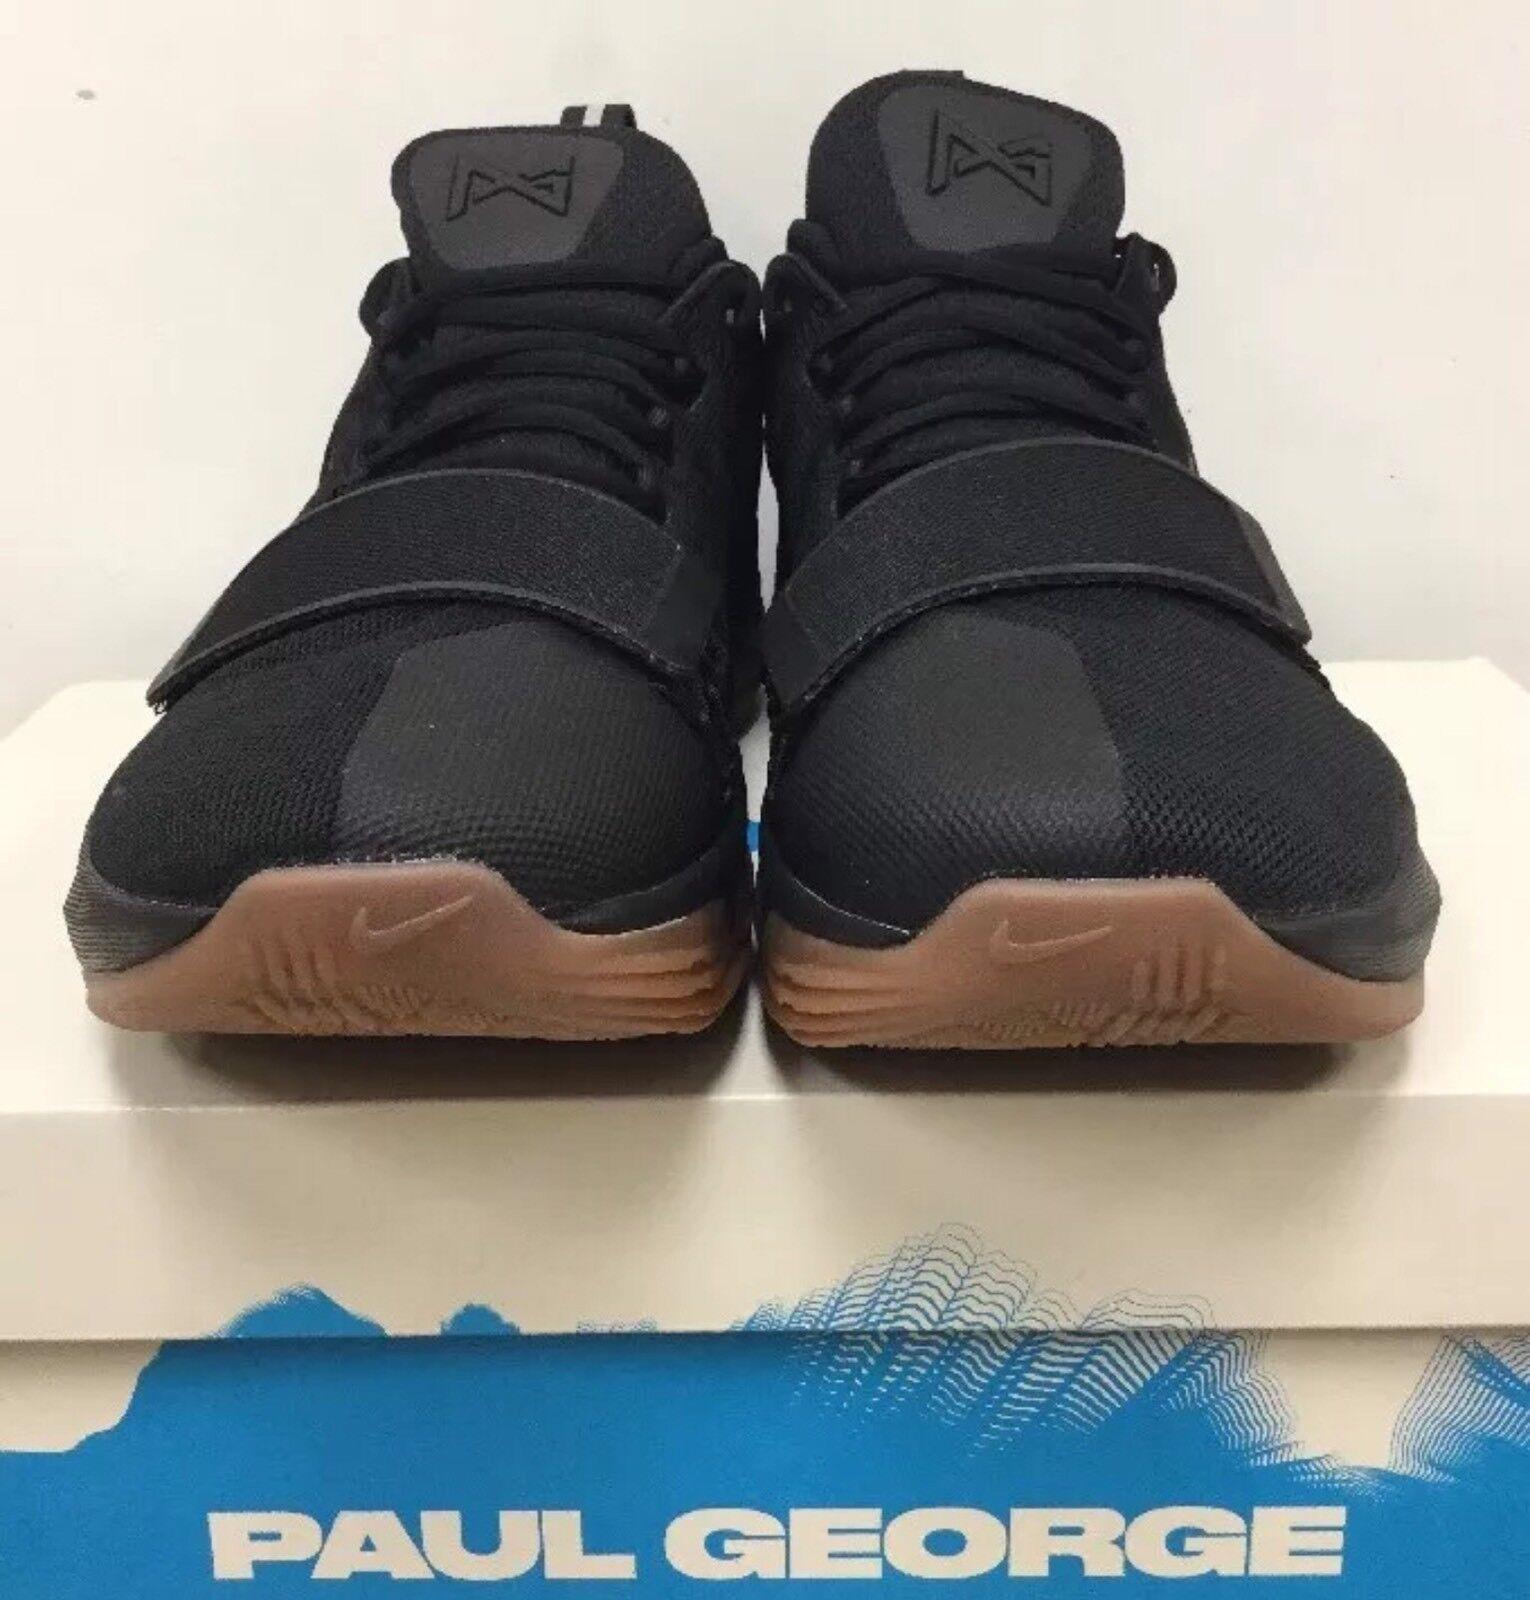 New Nike PG1 Paul George Men Basketball Black/Anthracite/Gum 878627 004 SZ 11